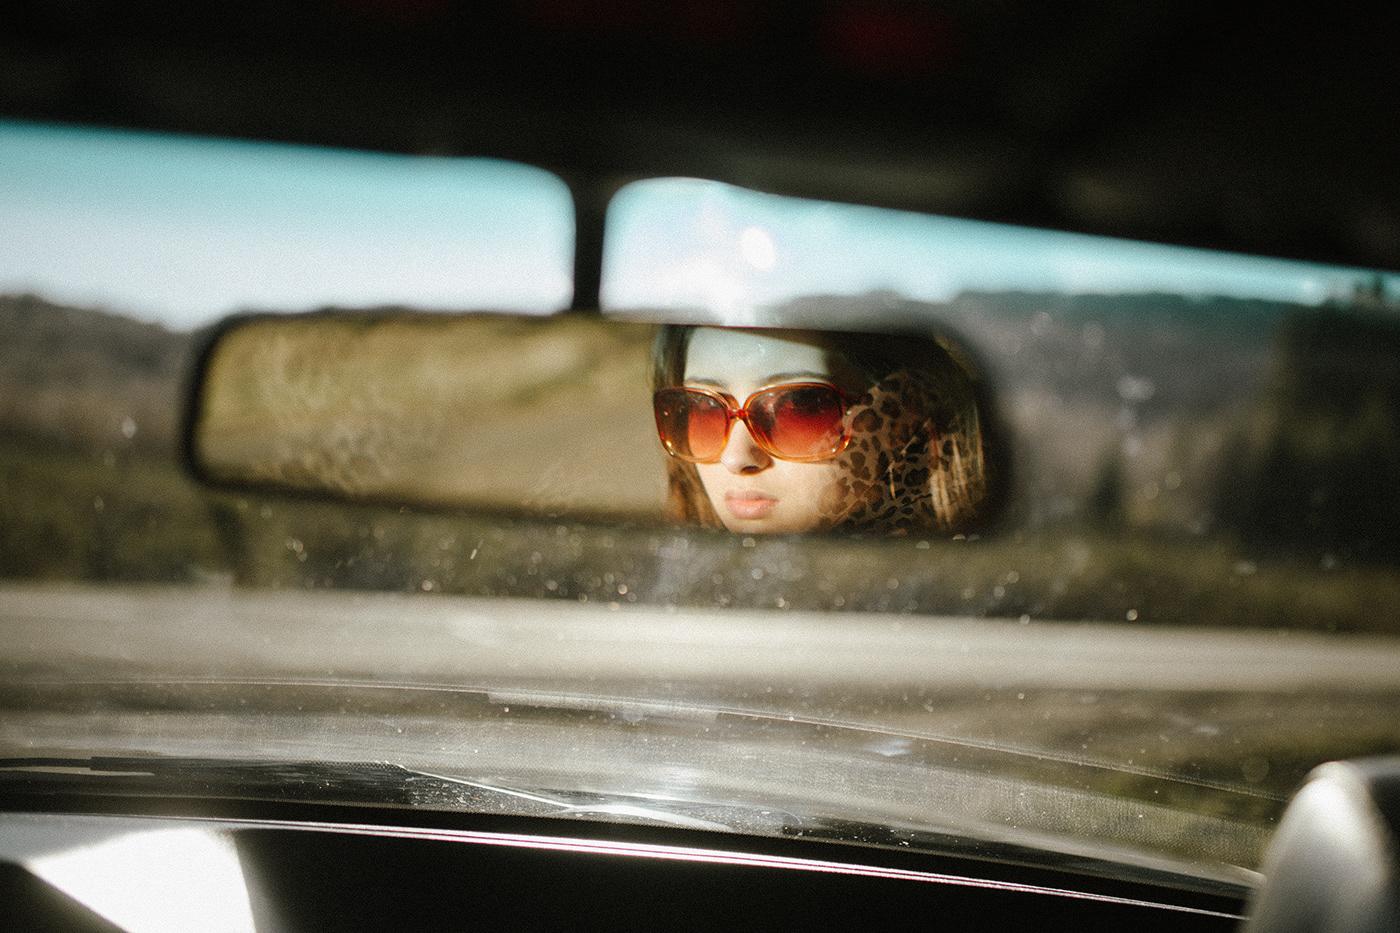 Image may contain: car, human face and sunglasses